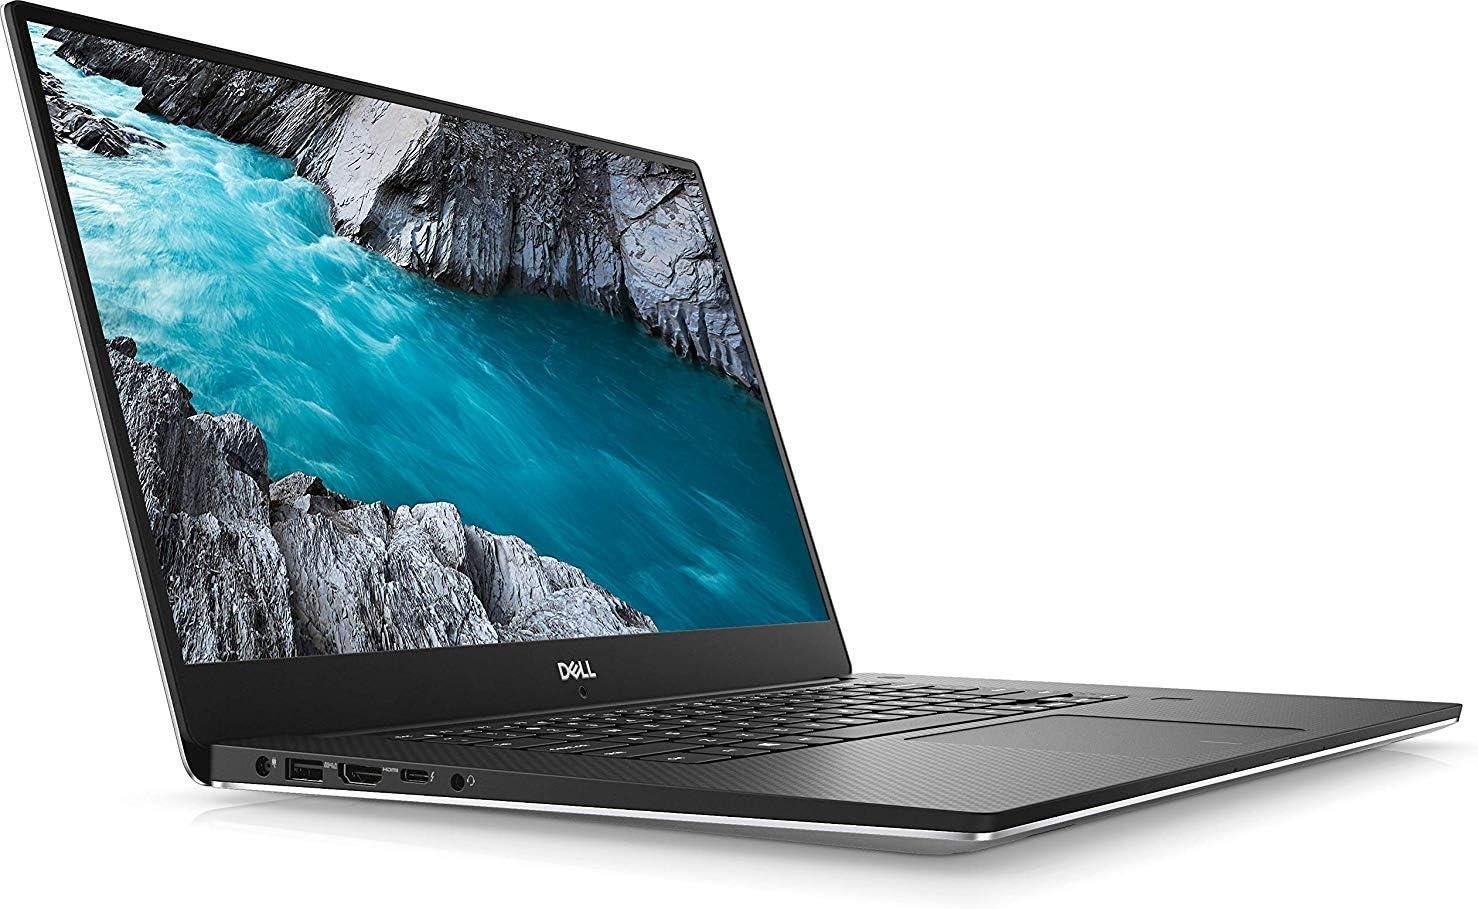 Dell XPS 15 9570 Gaming Laptop i9-8950HK GTX 1050Ti 4GB 15.6in 4K UHD Anti-Reflective Touch 2TB SSD   32GB RAM   Win 10 PRO 64Bit (Renewed)